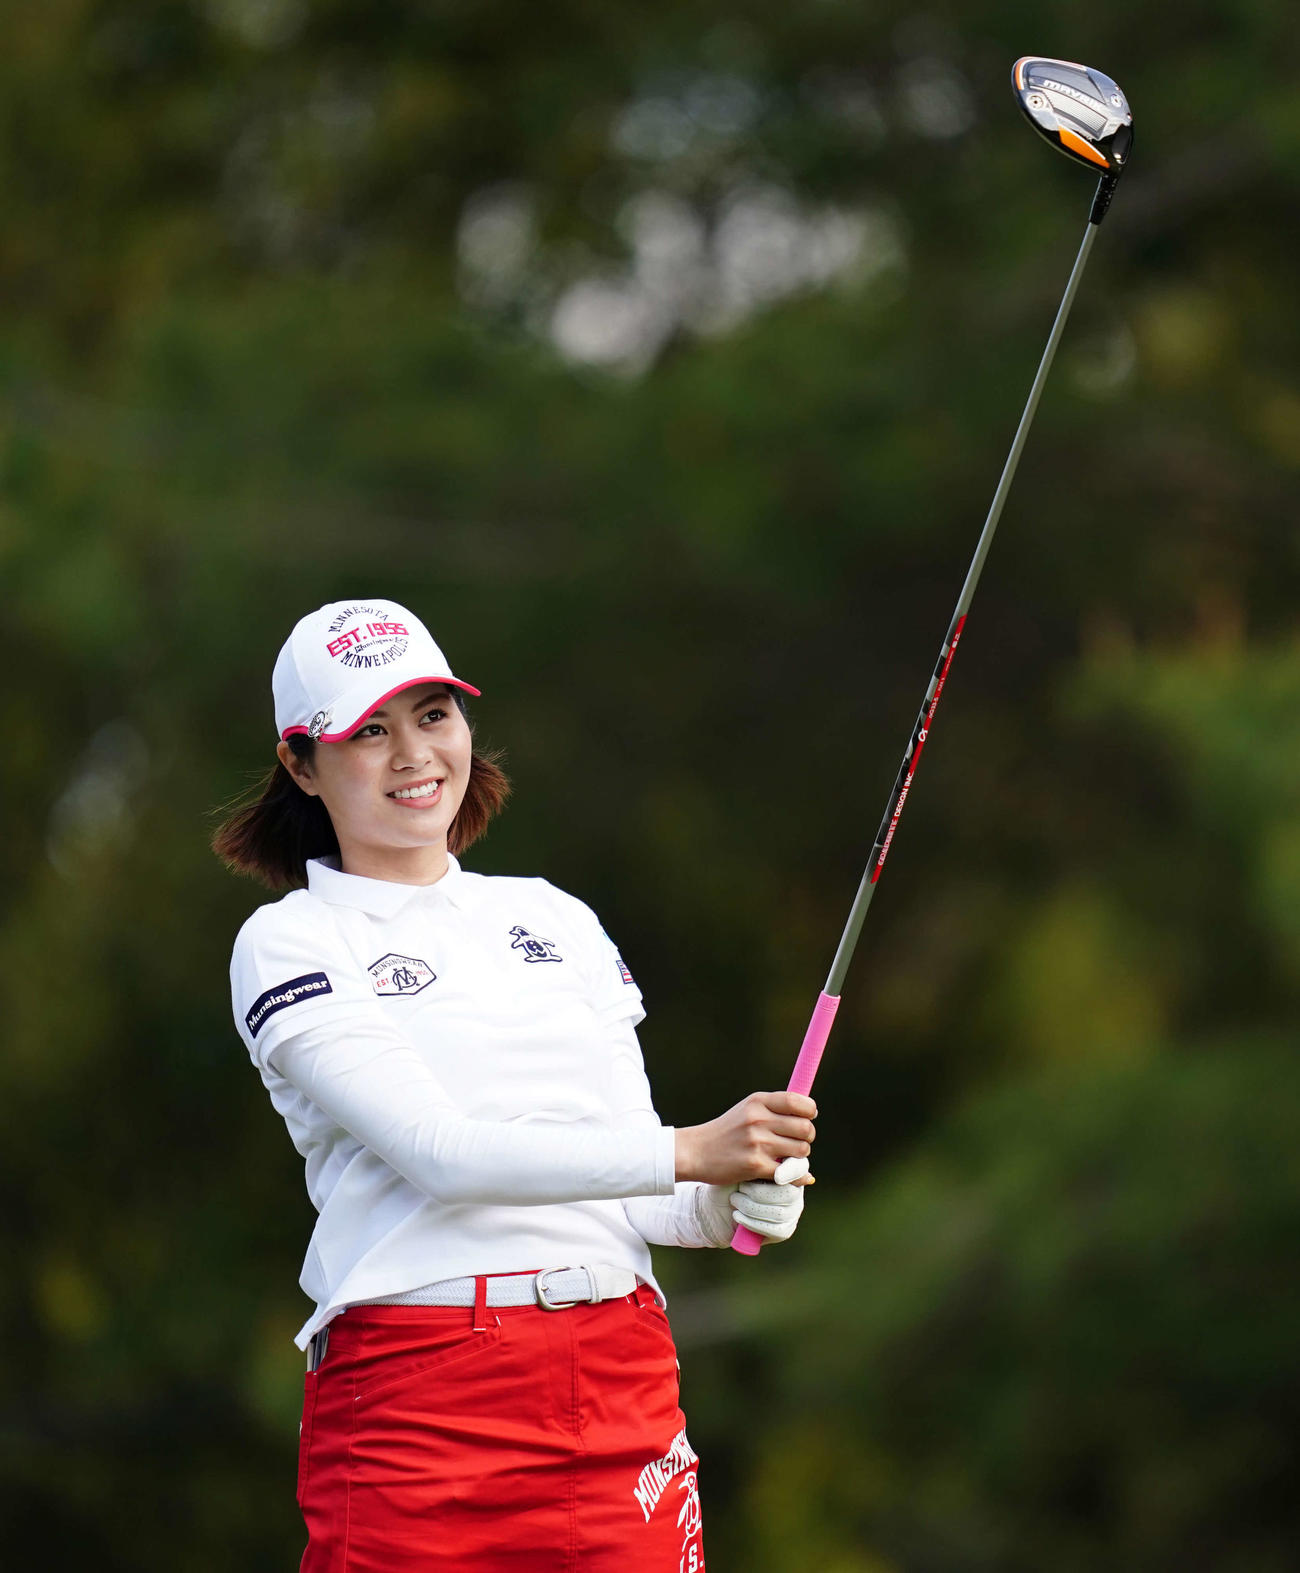 https://www.nikkansports.com/sports/golf/news/img/202104030000214-w1300_8.jpg